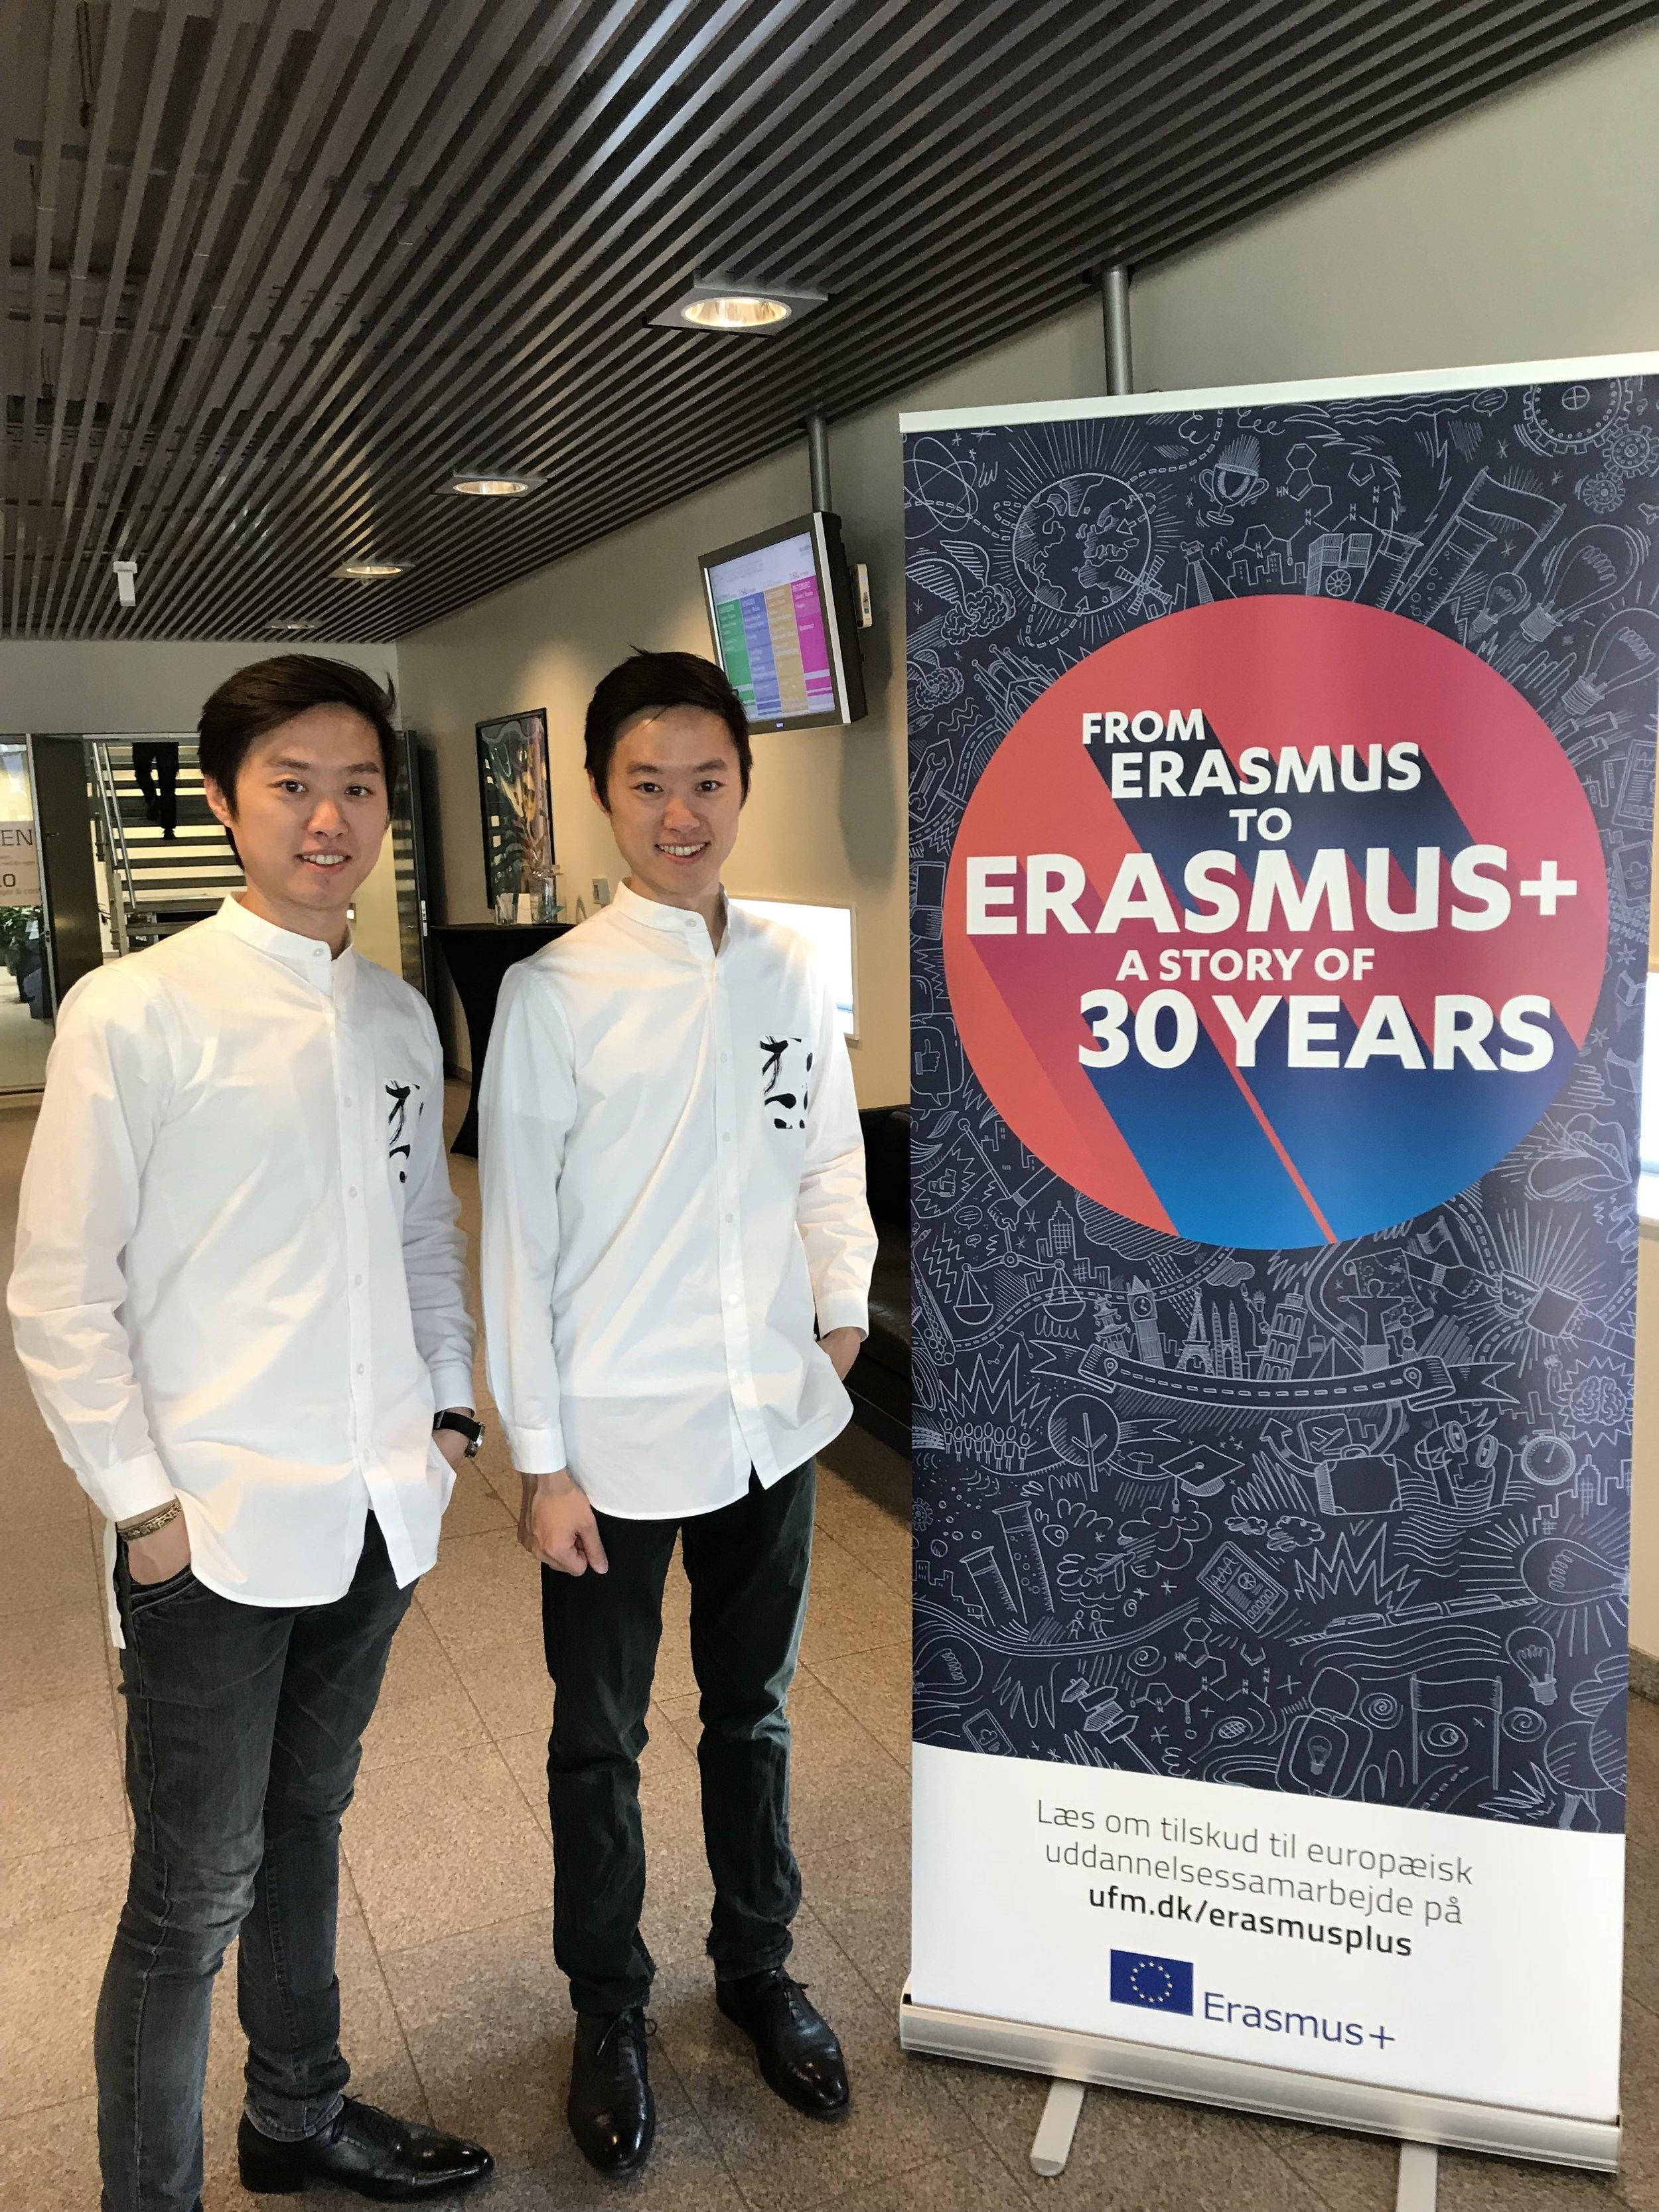 Erasmus 30th Anniversary with Banner